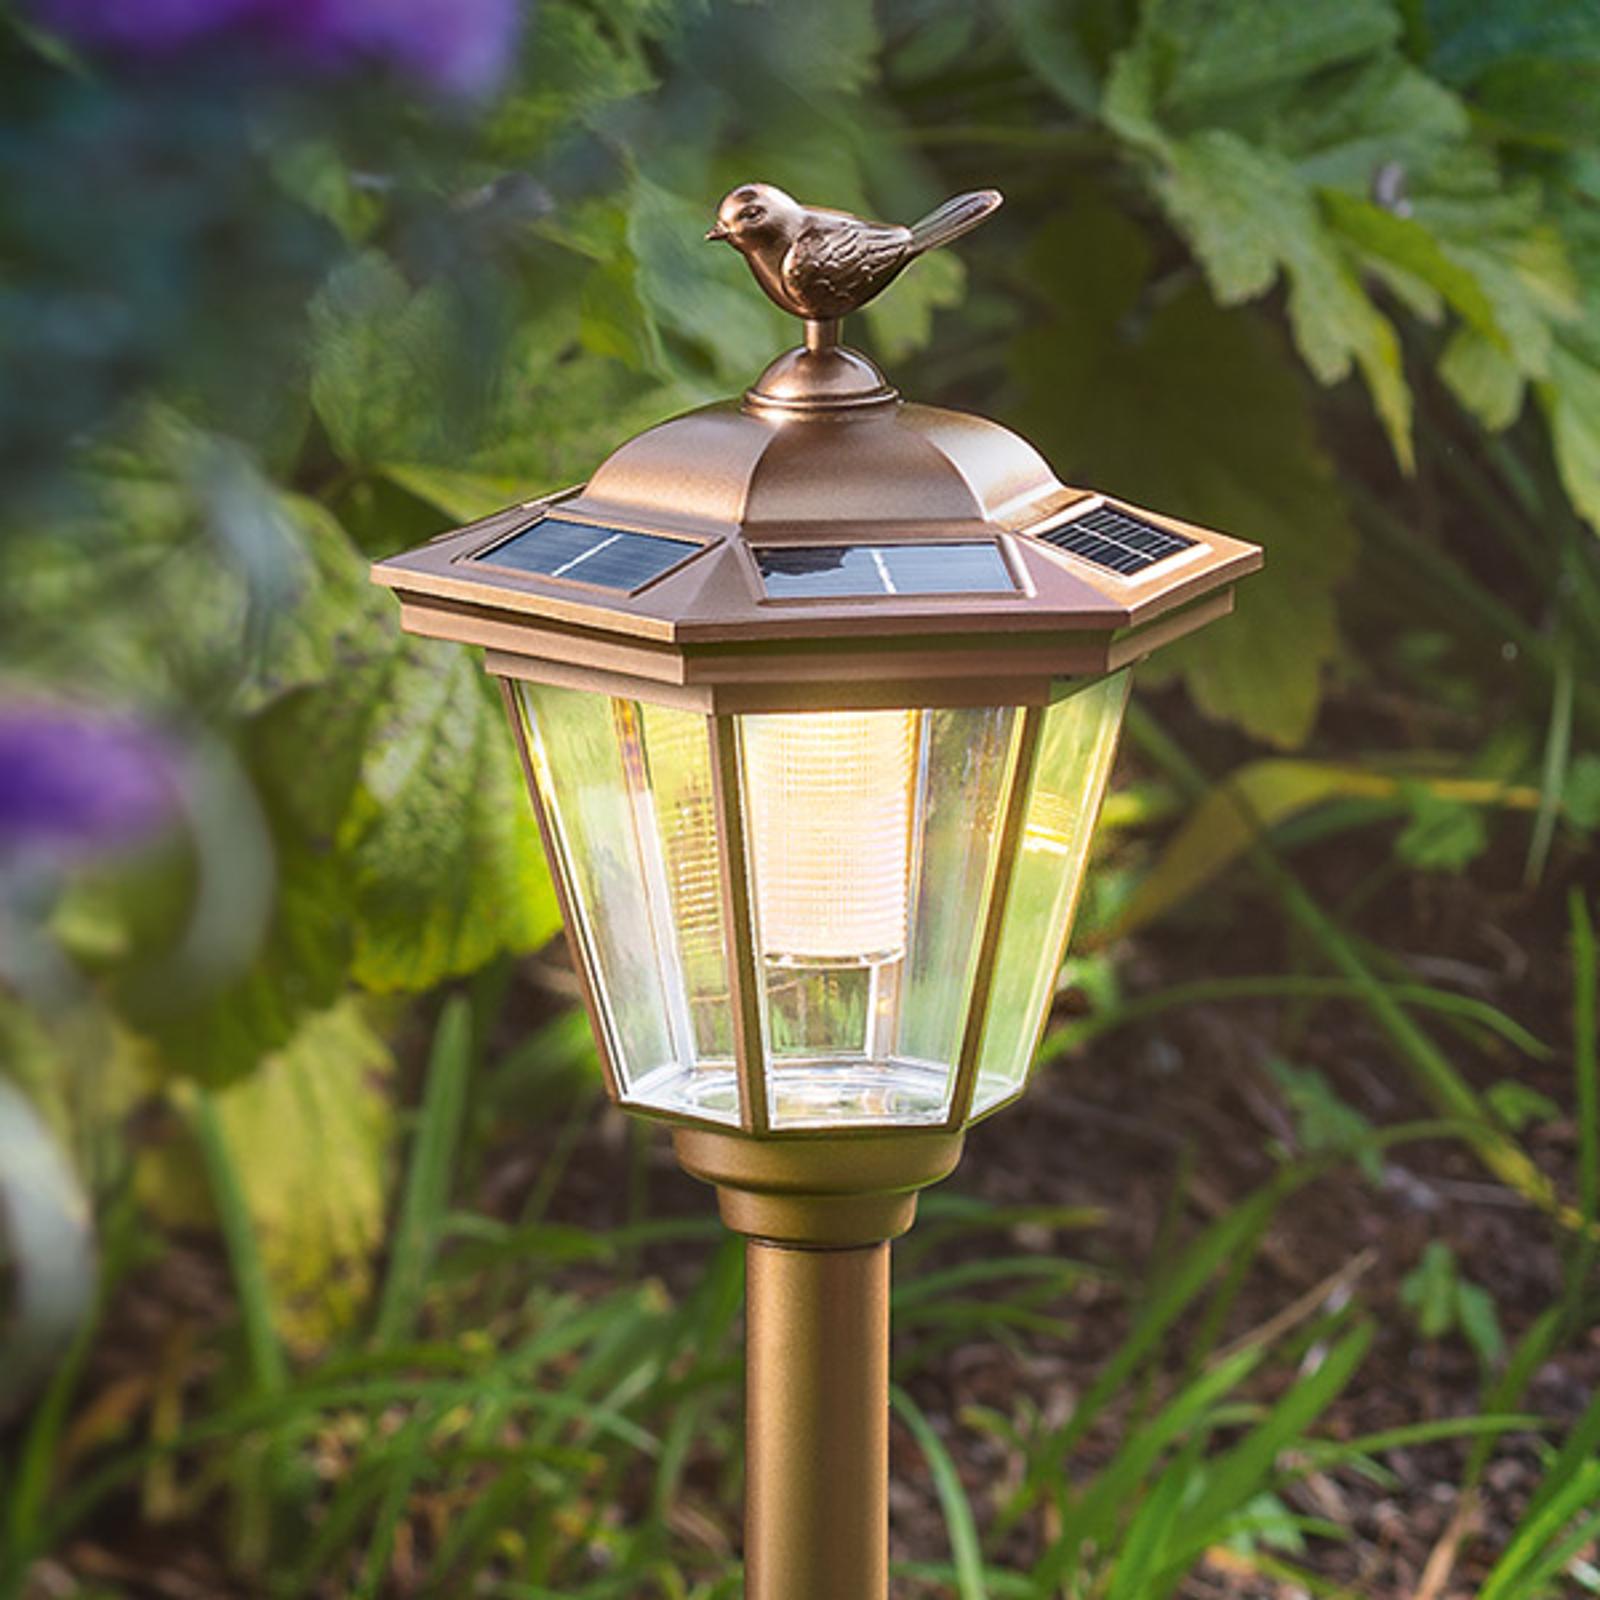 Luminaire piquet LED solaire Tivoli, aspect cuivre